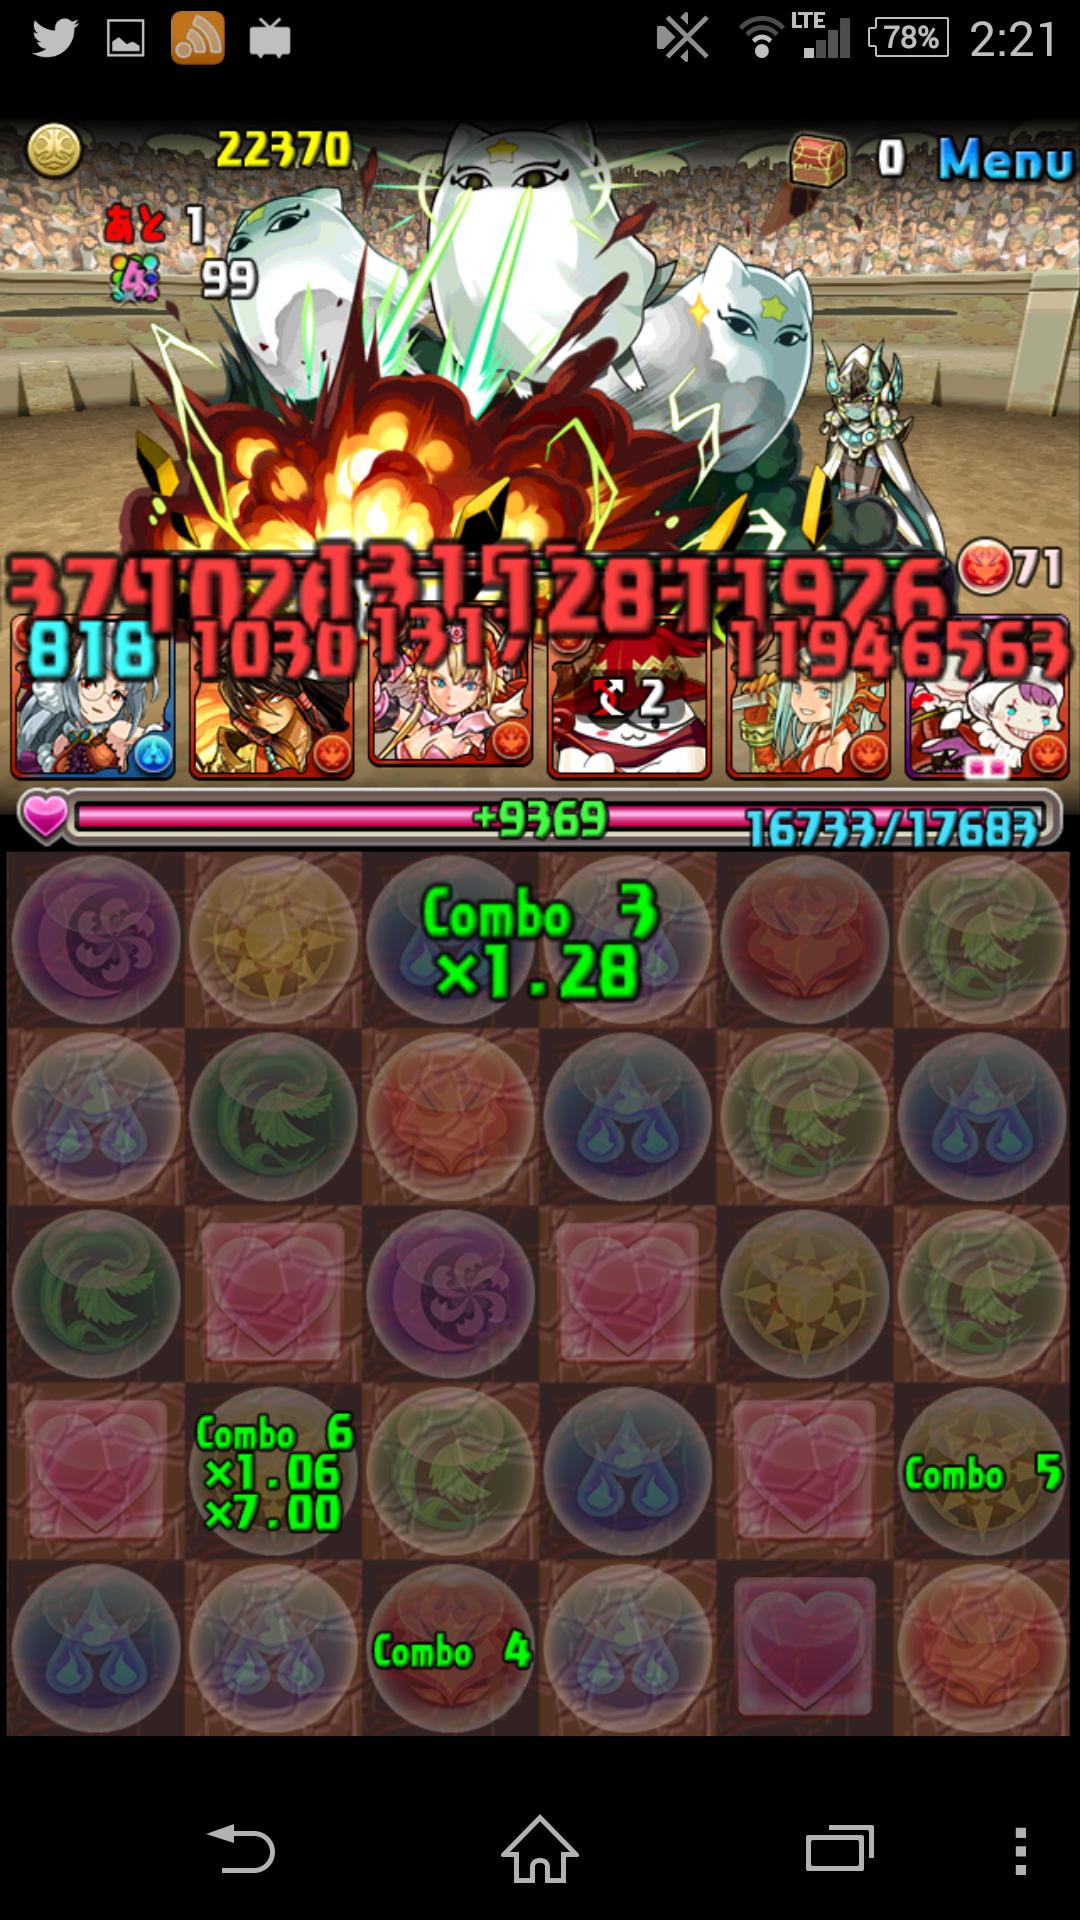 Screenshot_2015-03-12-02-21-55.png